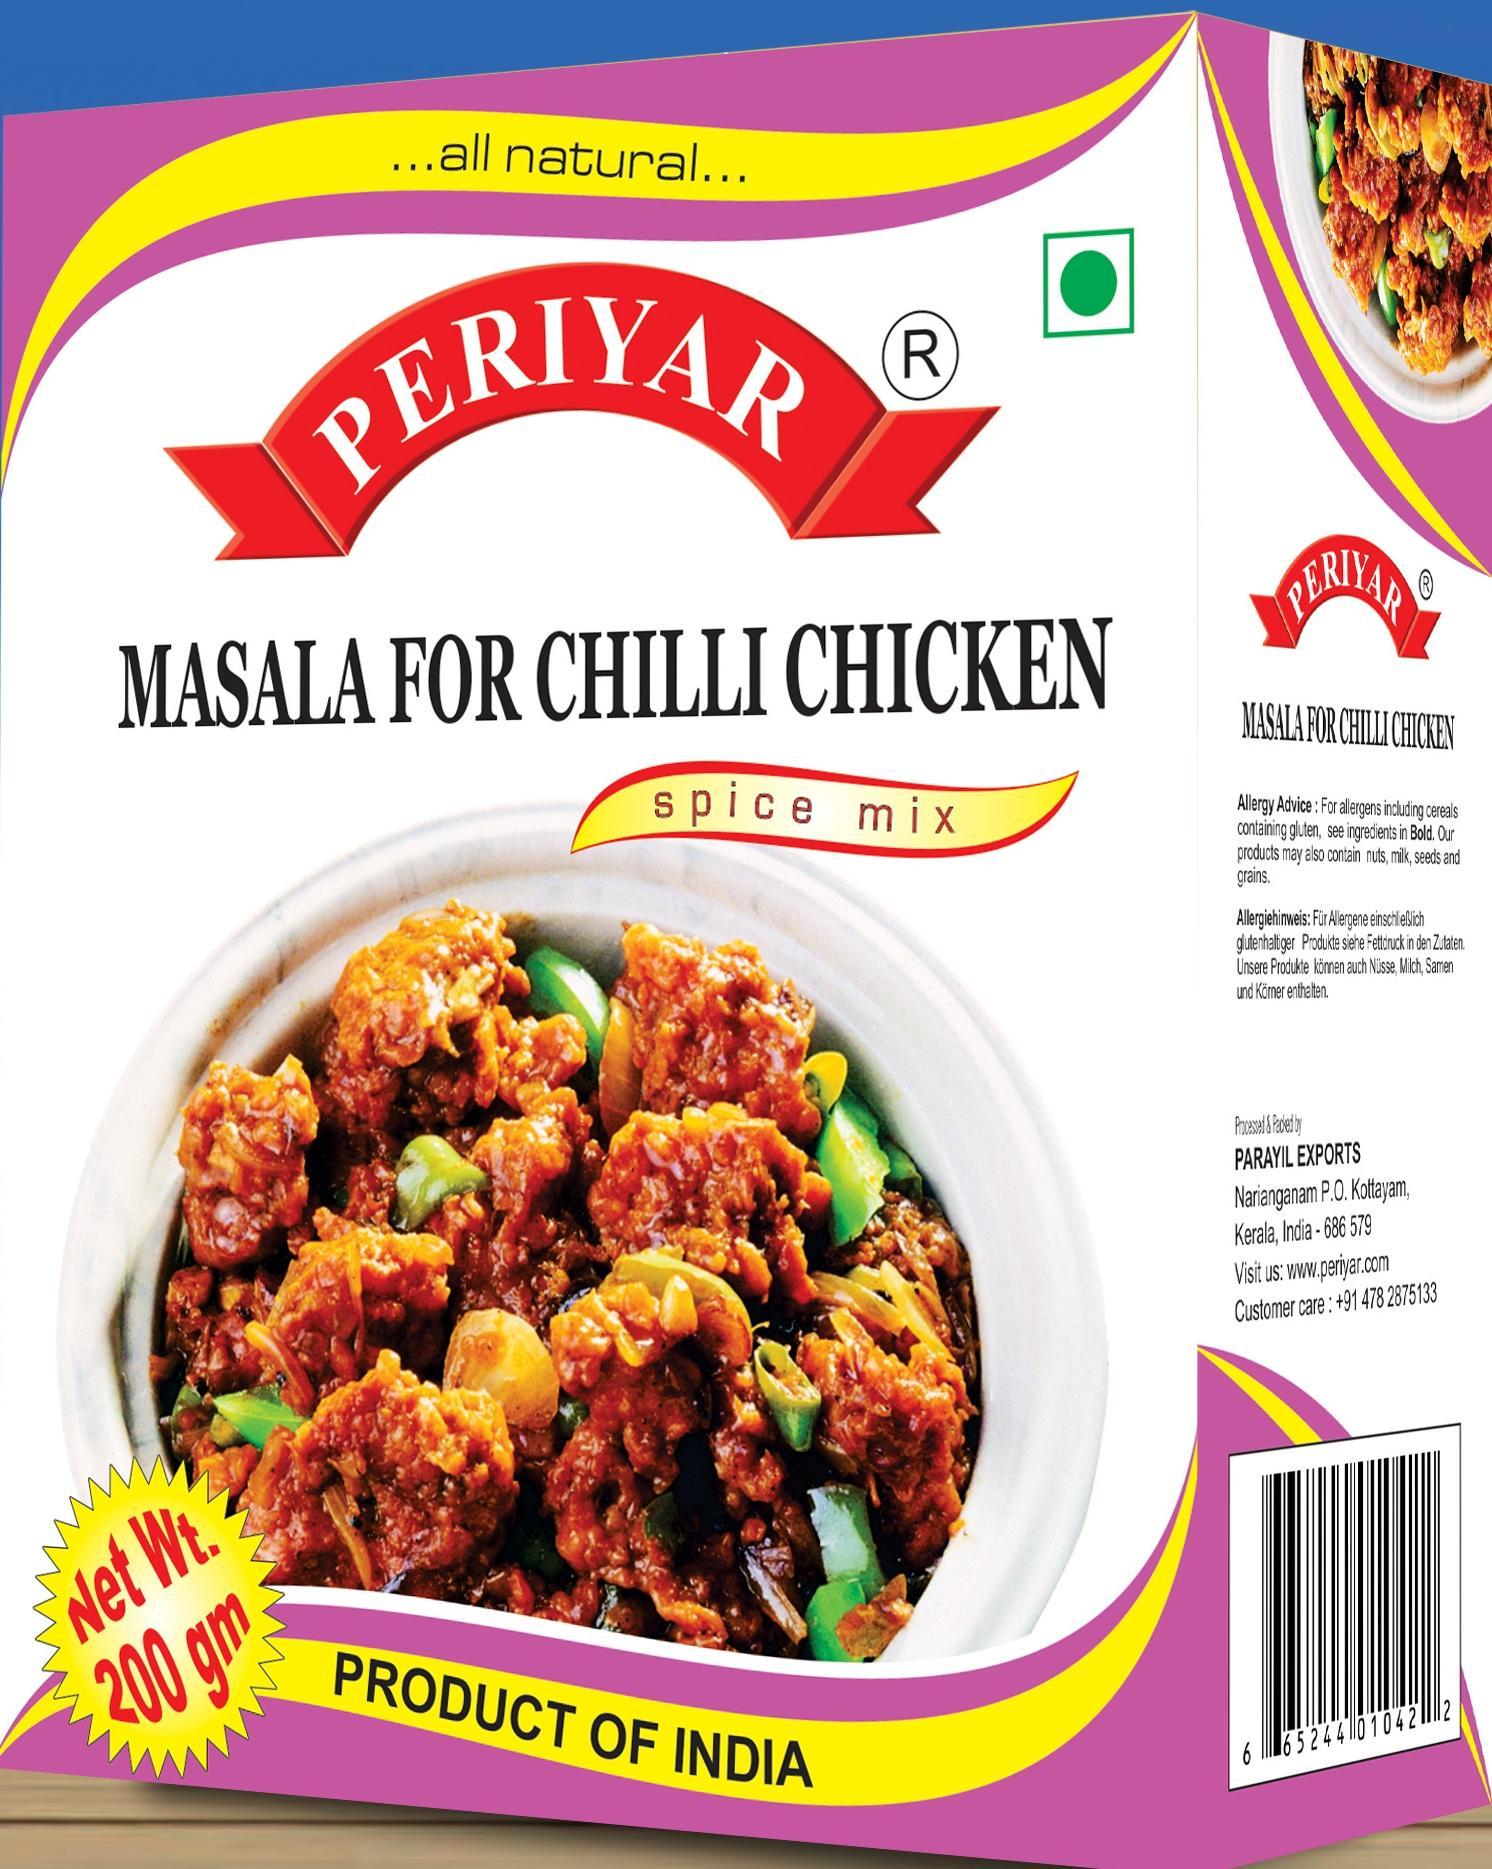 Periyar Masala for Chilli Chicken